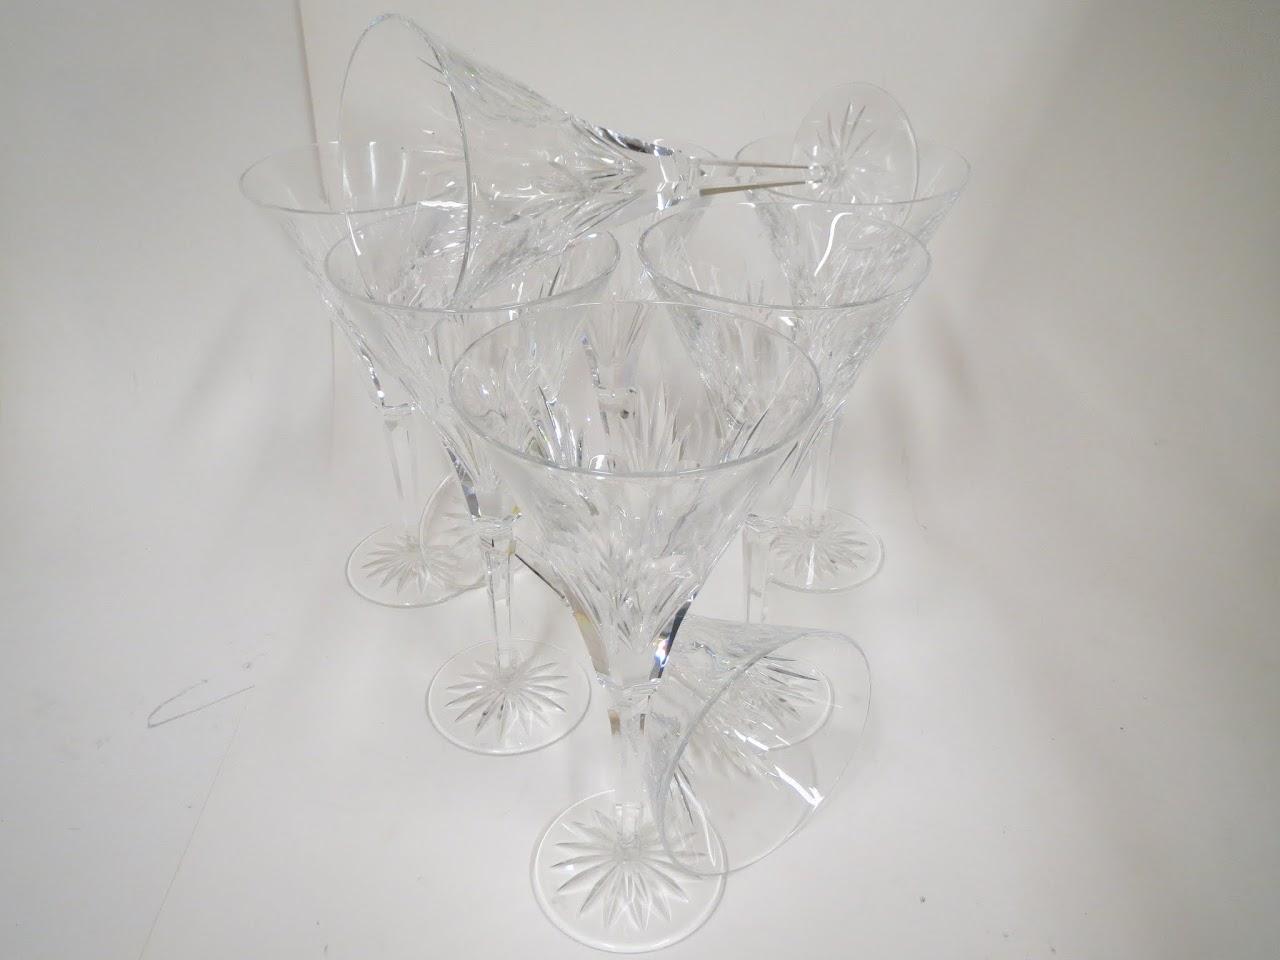 Waterford Crystal Stemware Set of 8 - Ashleigh Pattern